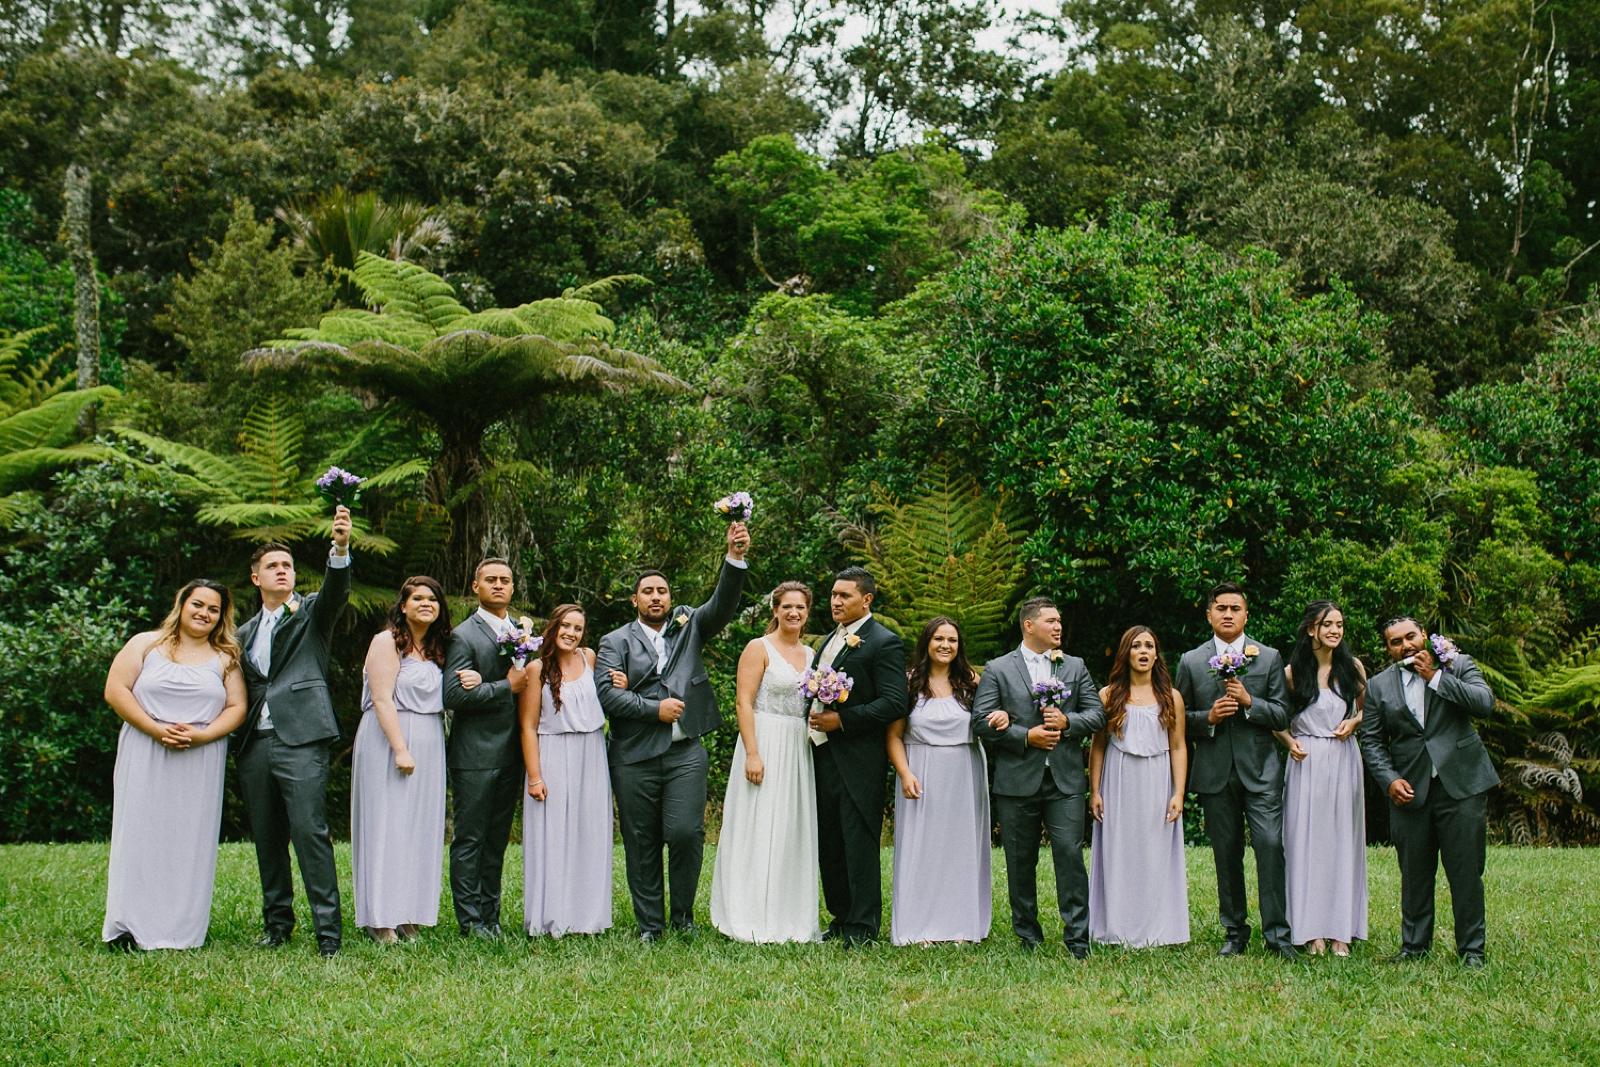 GabbyFiti_Auckland Wedding Photographer_Patty Lagera_0045.jpg